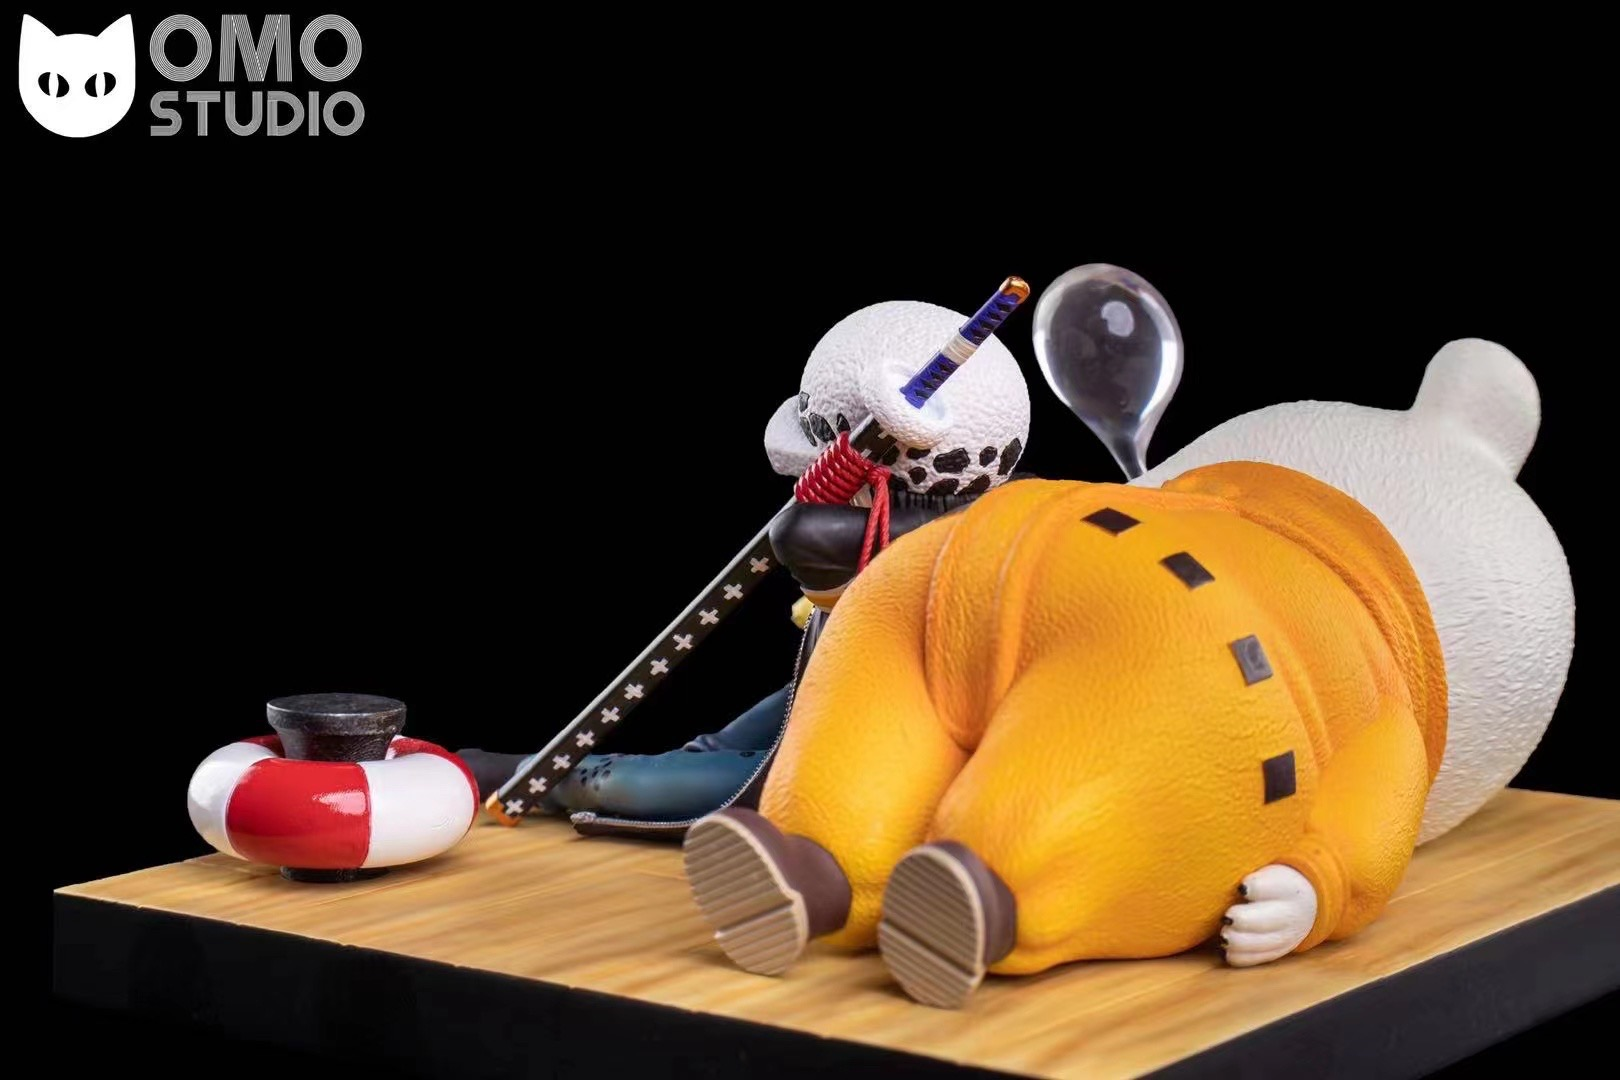 Trafalgar Law x Bepo ลอว์ x เป๊ปโปะ by OMO Studio (มัดจำ) [[SOLD OUT]]